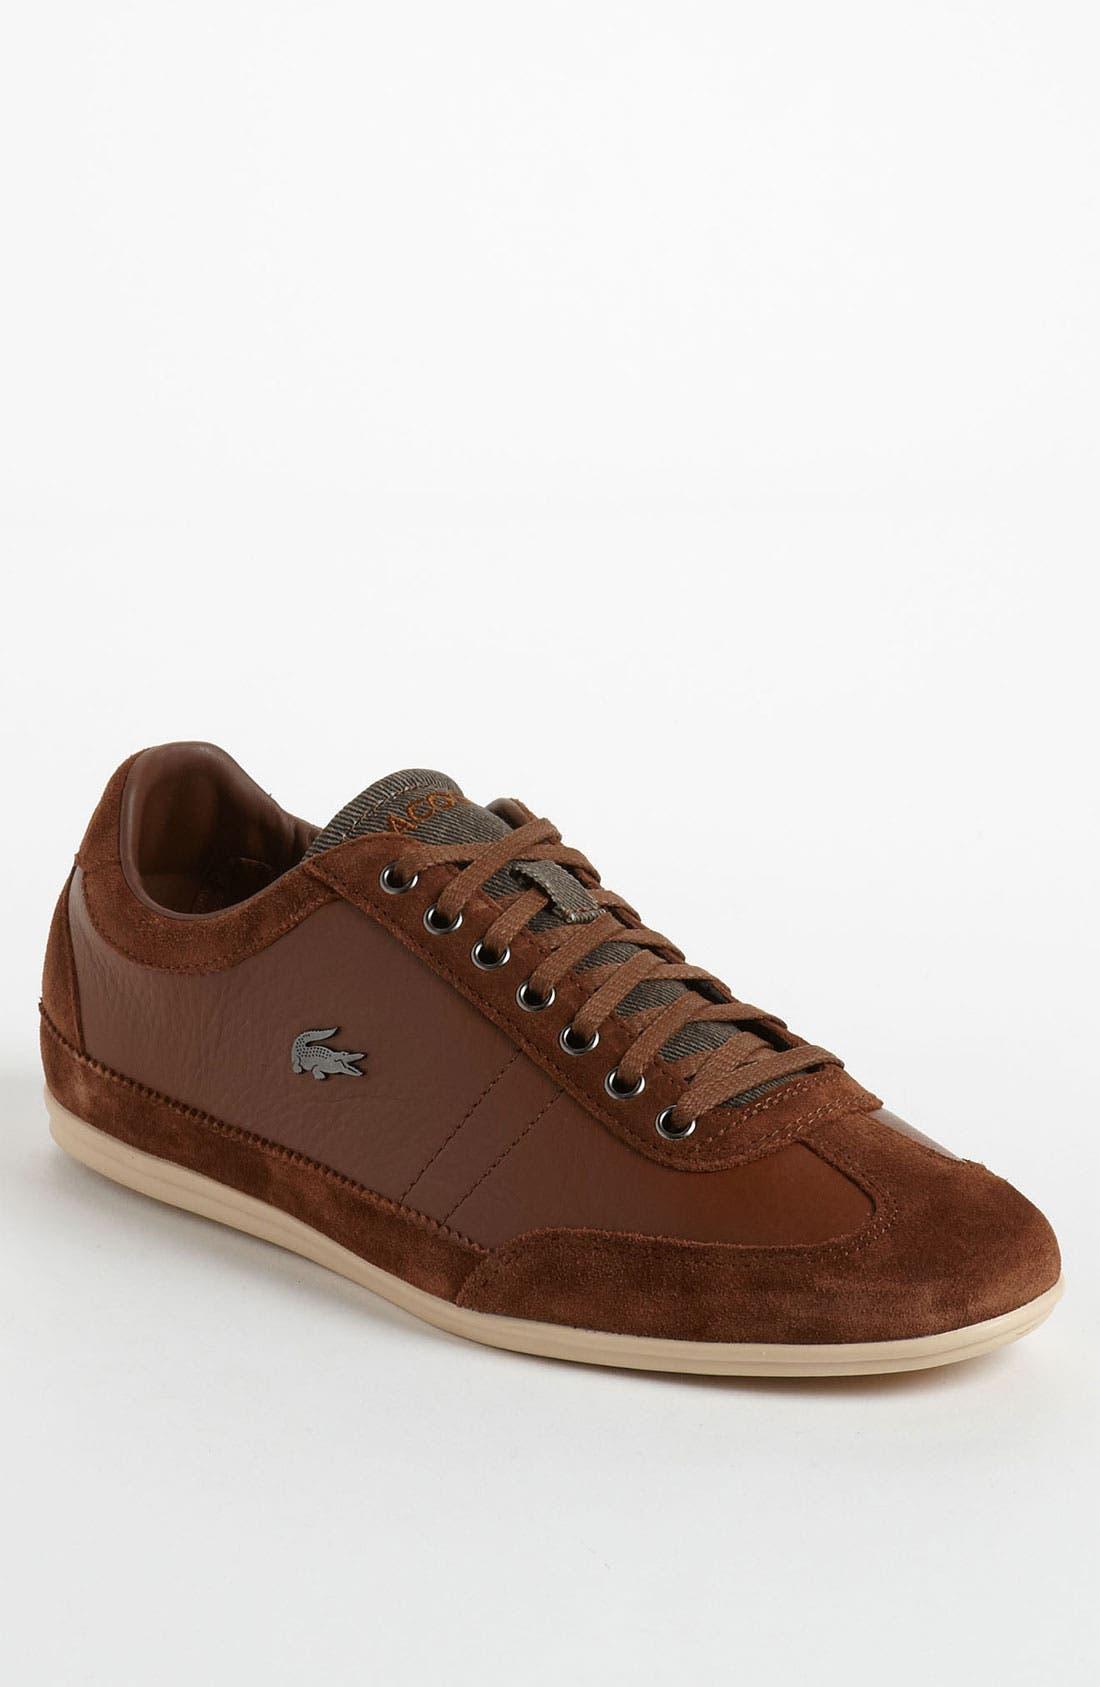 Main Image - Lacoste 'Misano 19' Sneaker (Men)